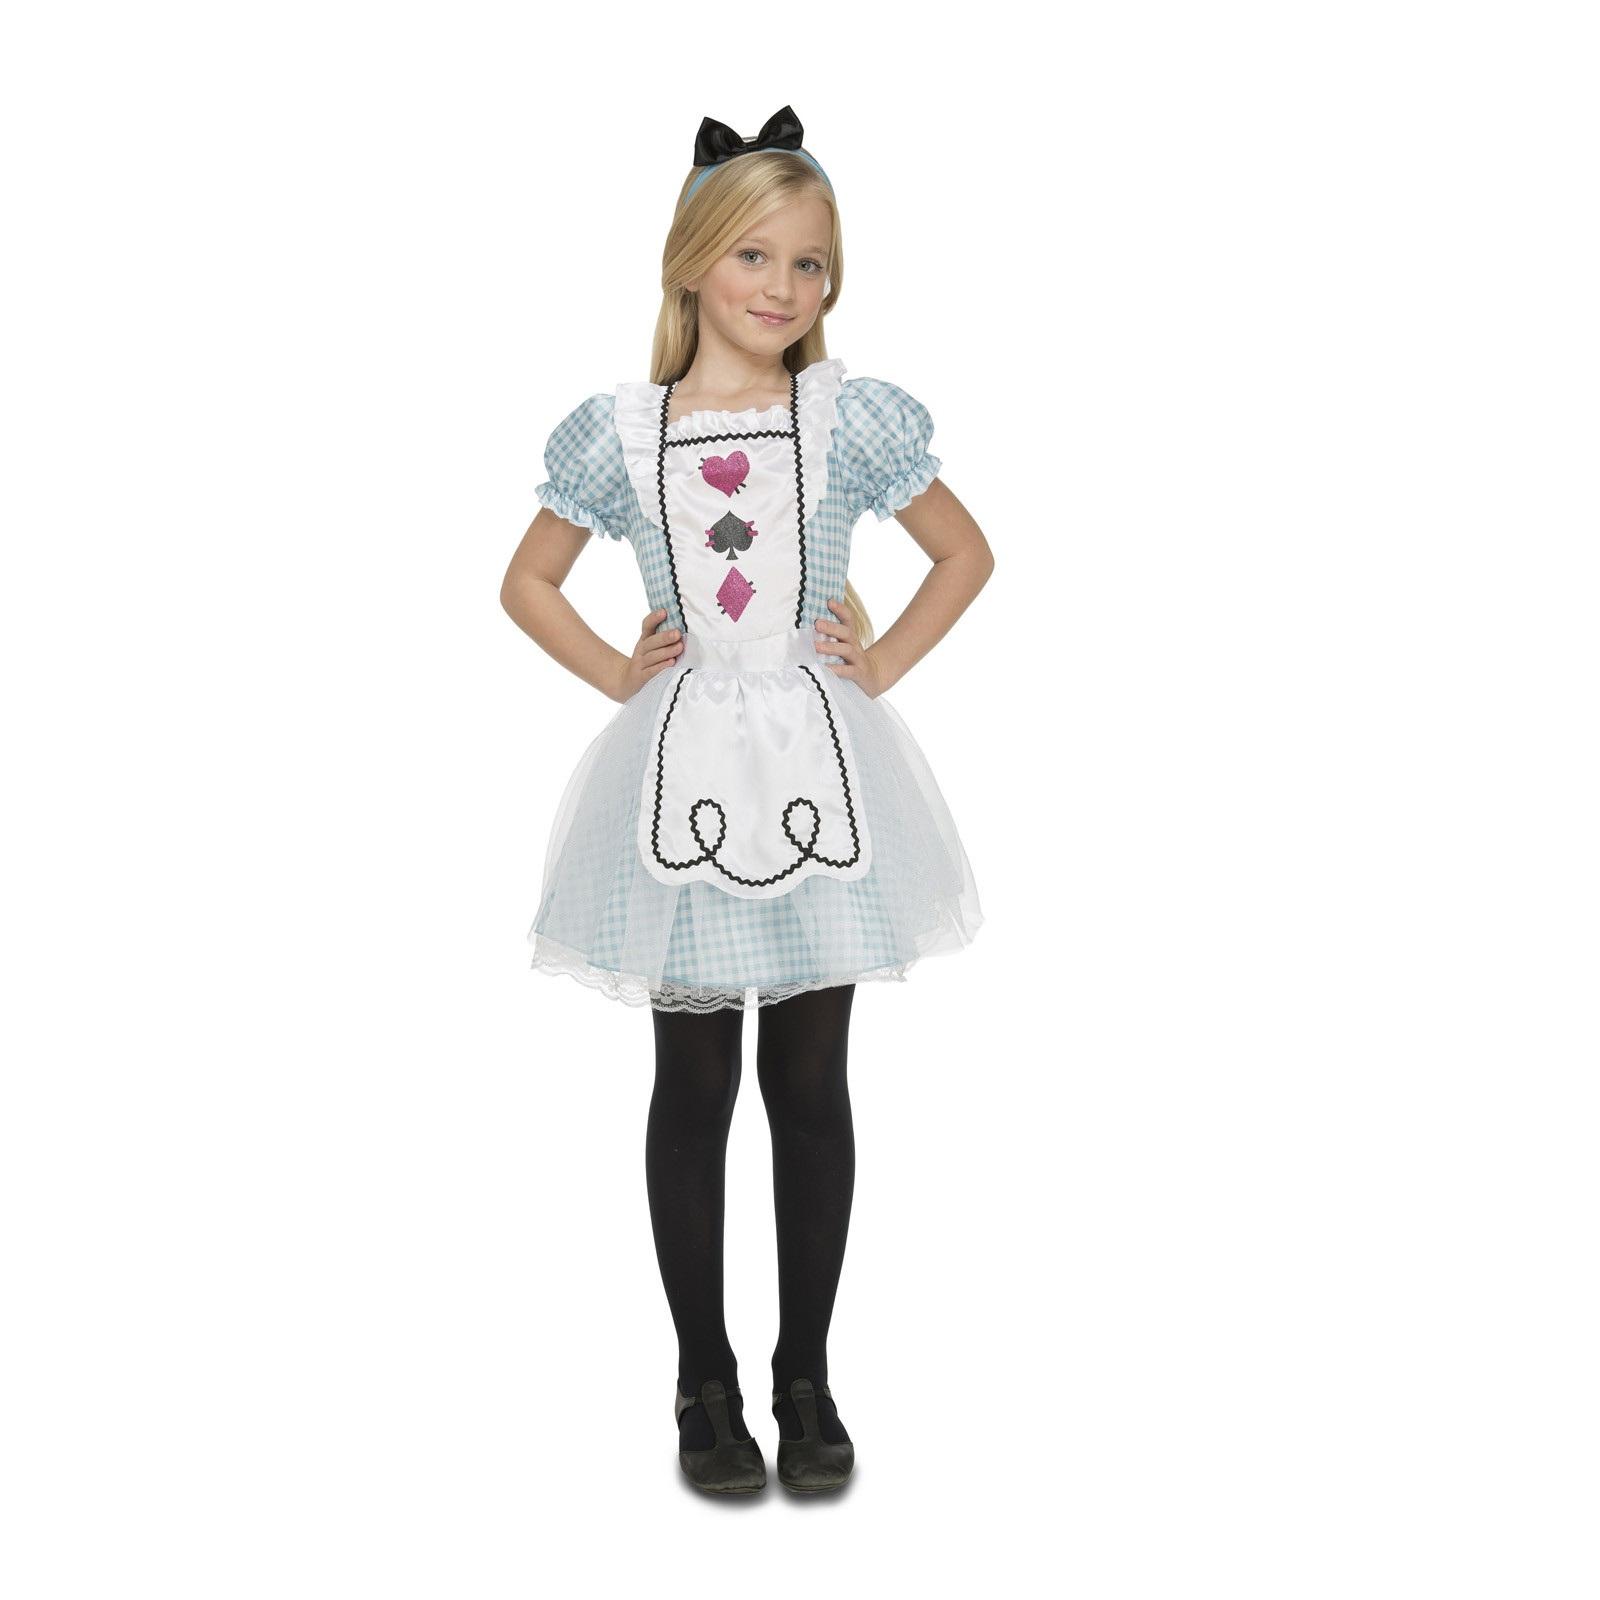 disfraz pequeña alicia niña 204092mom - DISFRAZ DE PEQUEÑA ALICIA NIÑA